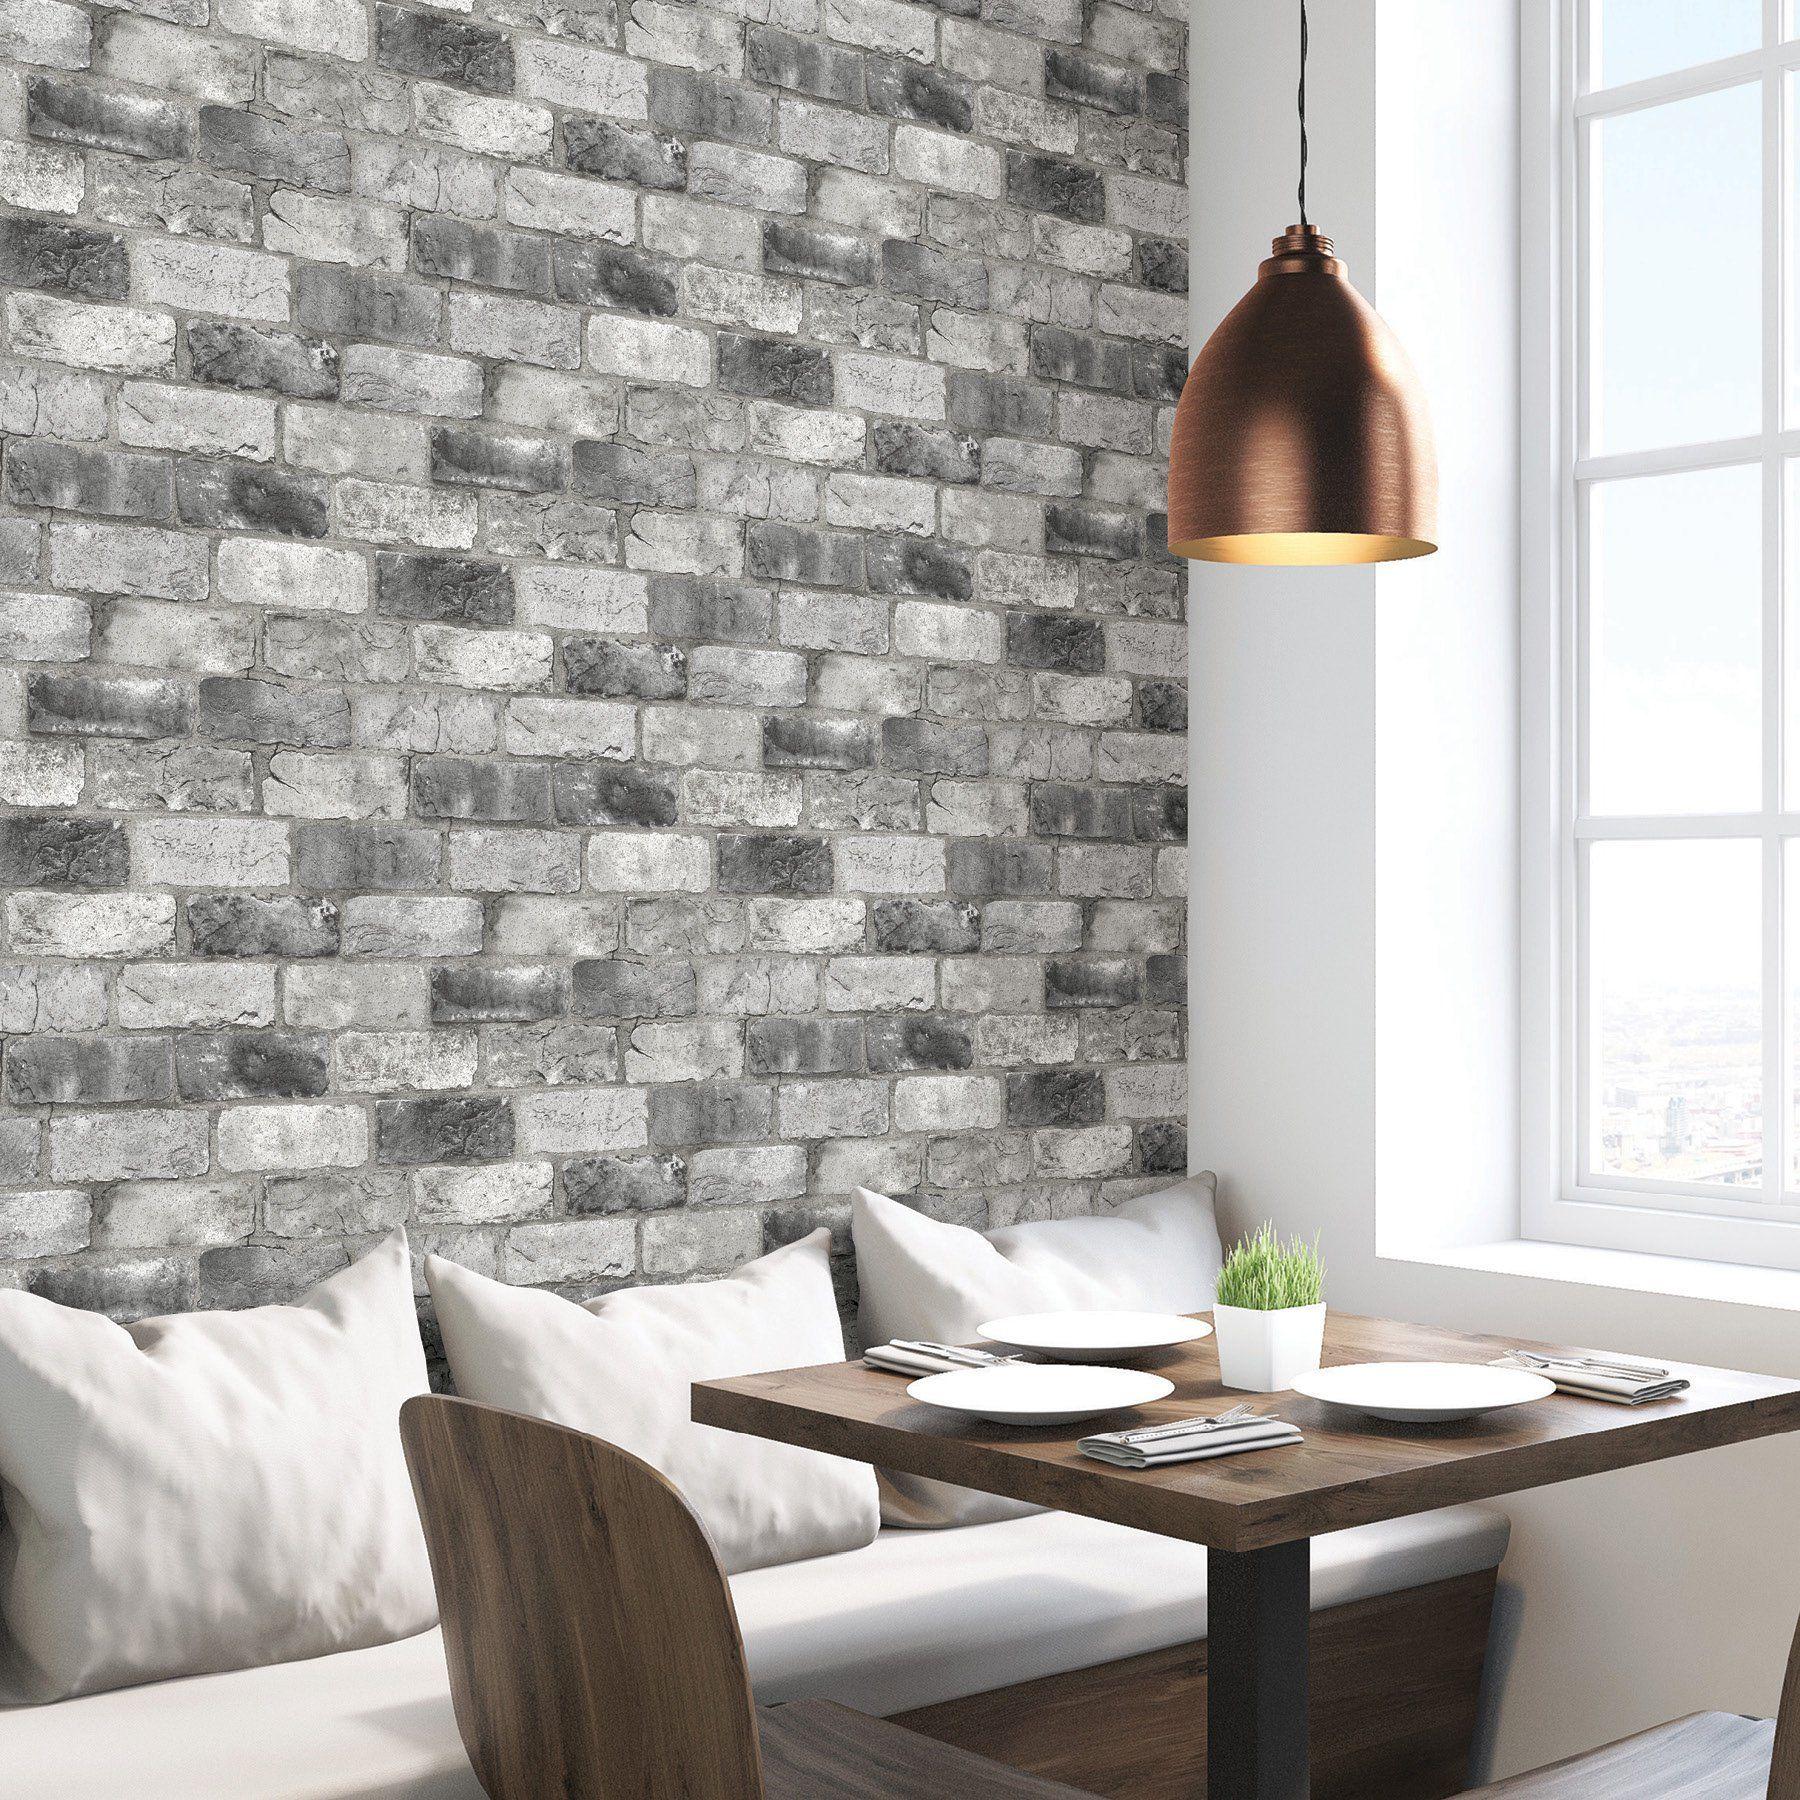 Nuwallpaper Grey London Brick Peel Stick Wallpaper Walmart Com In 2021 London Brick Brick Wallpaper Accent Wall Fake Brick Wall